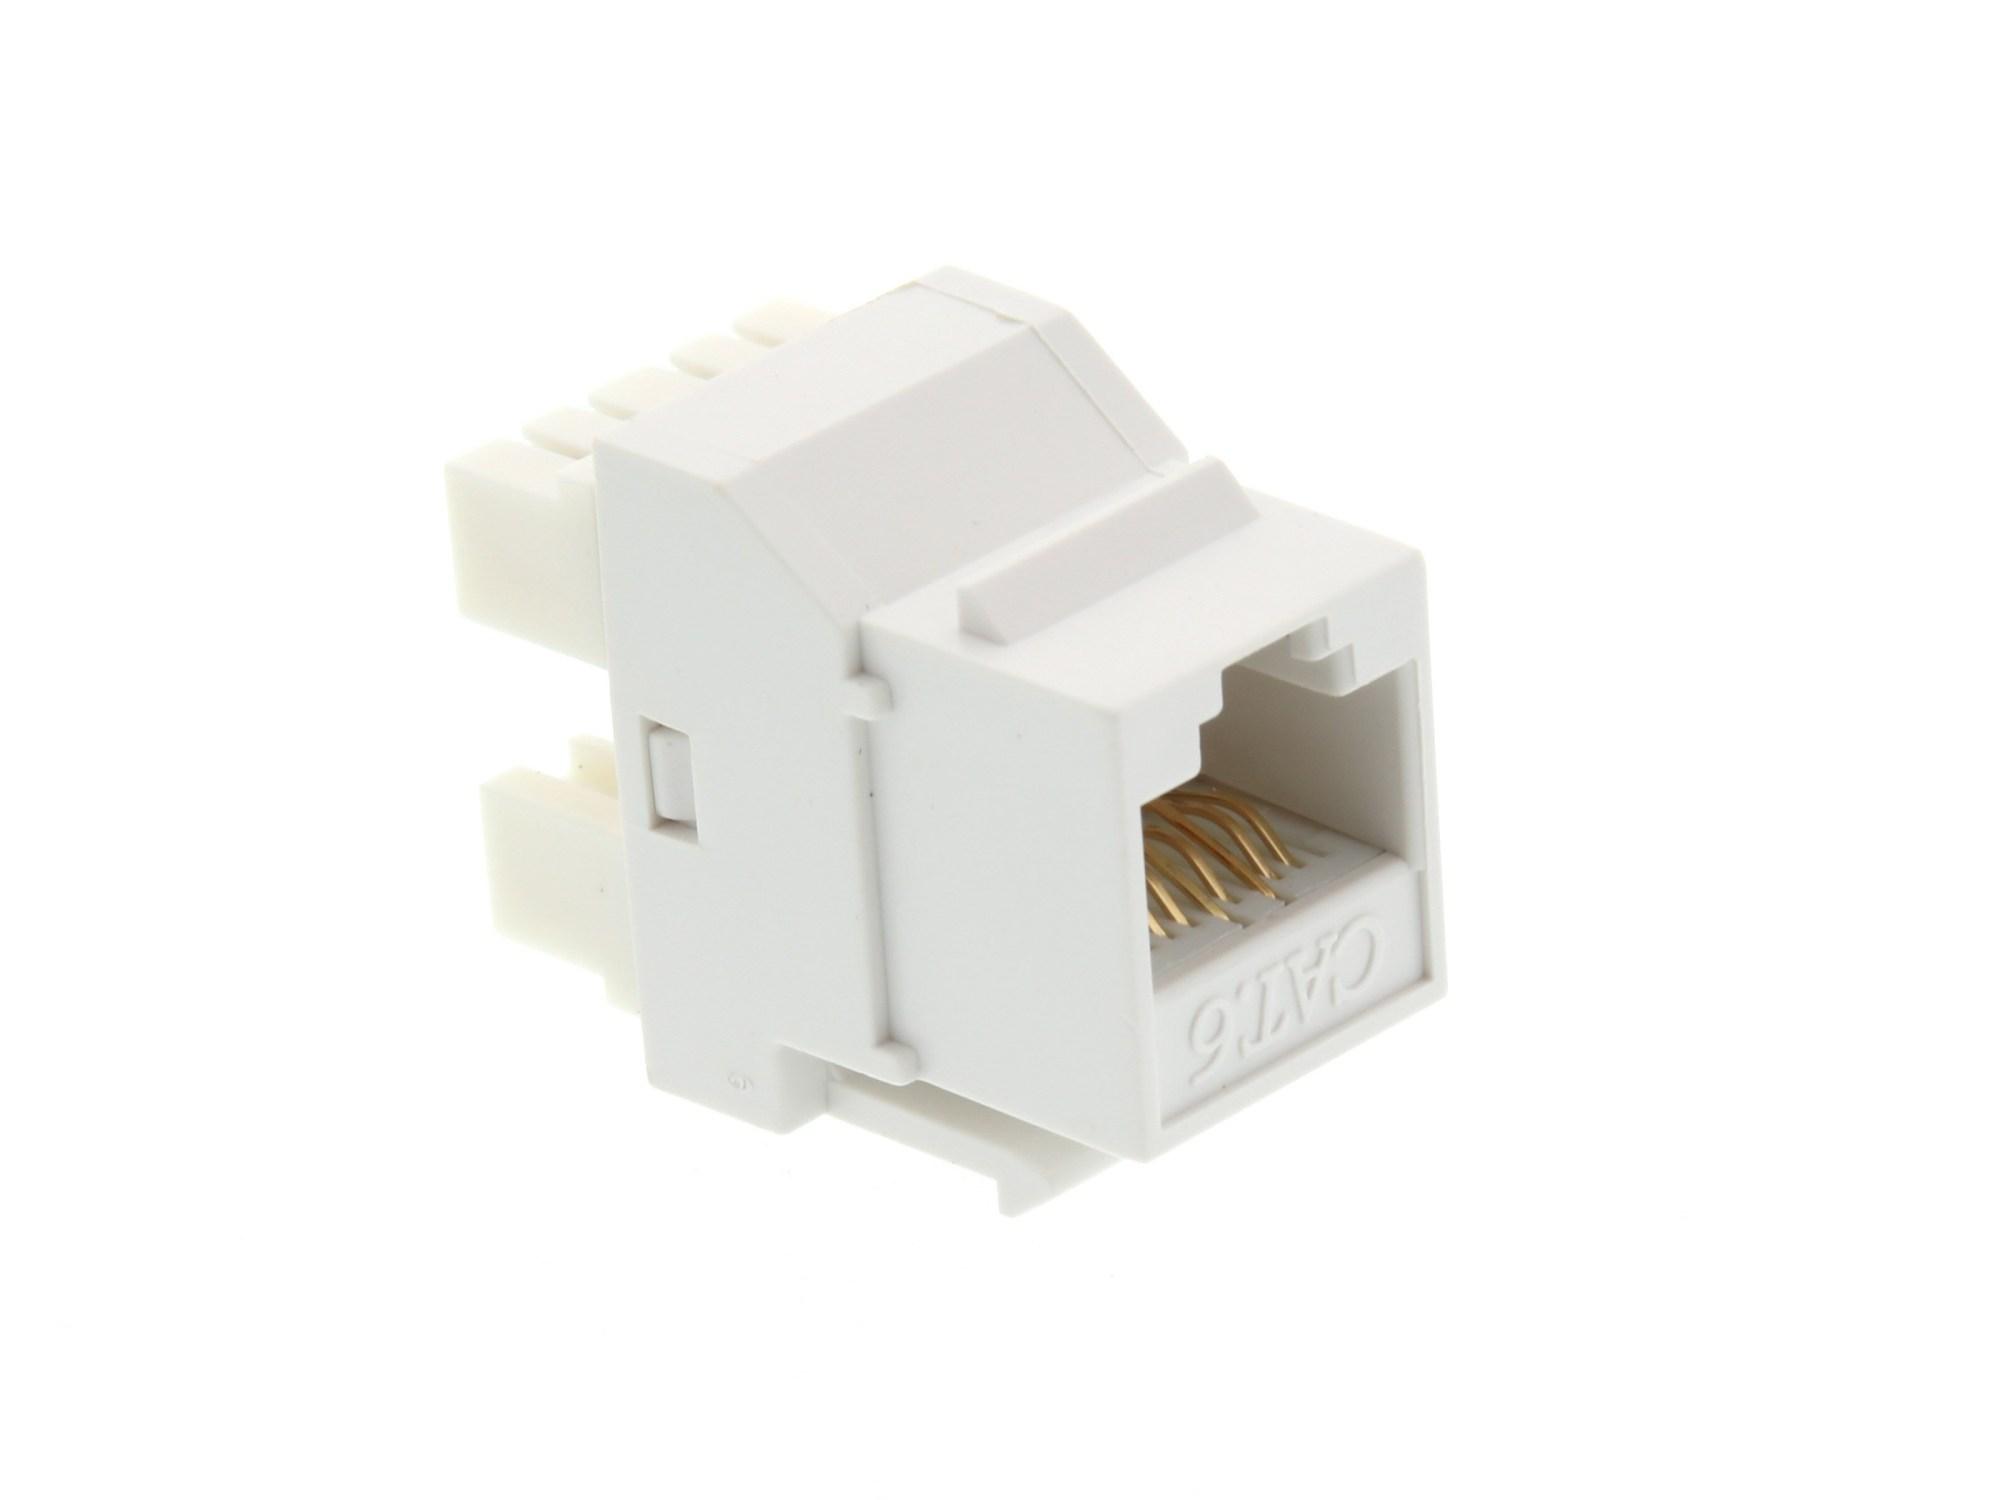 hight resolution of  picture of cat6 speedterm keystone jack 180 degree 110 utp white